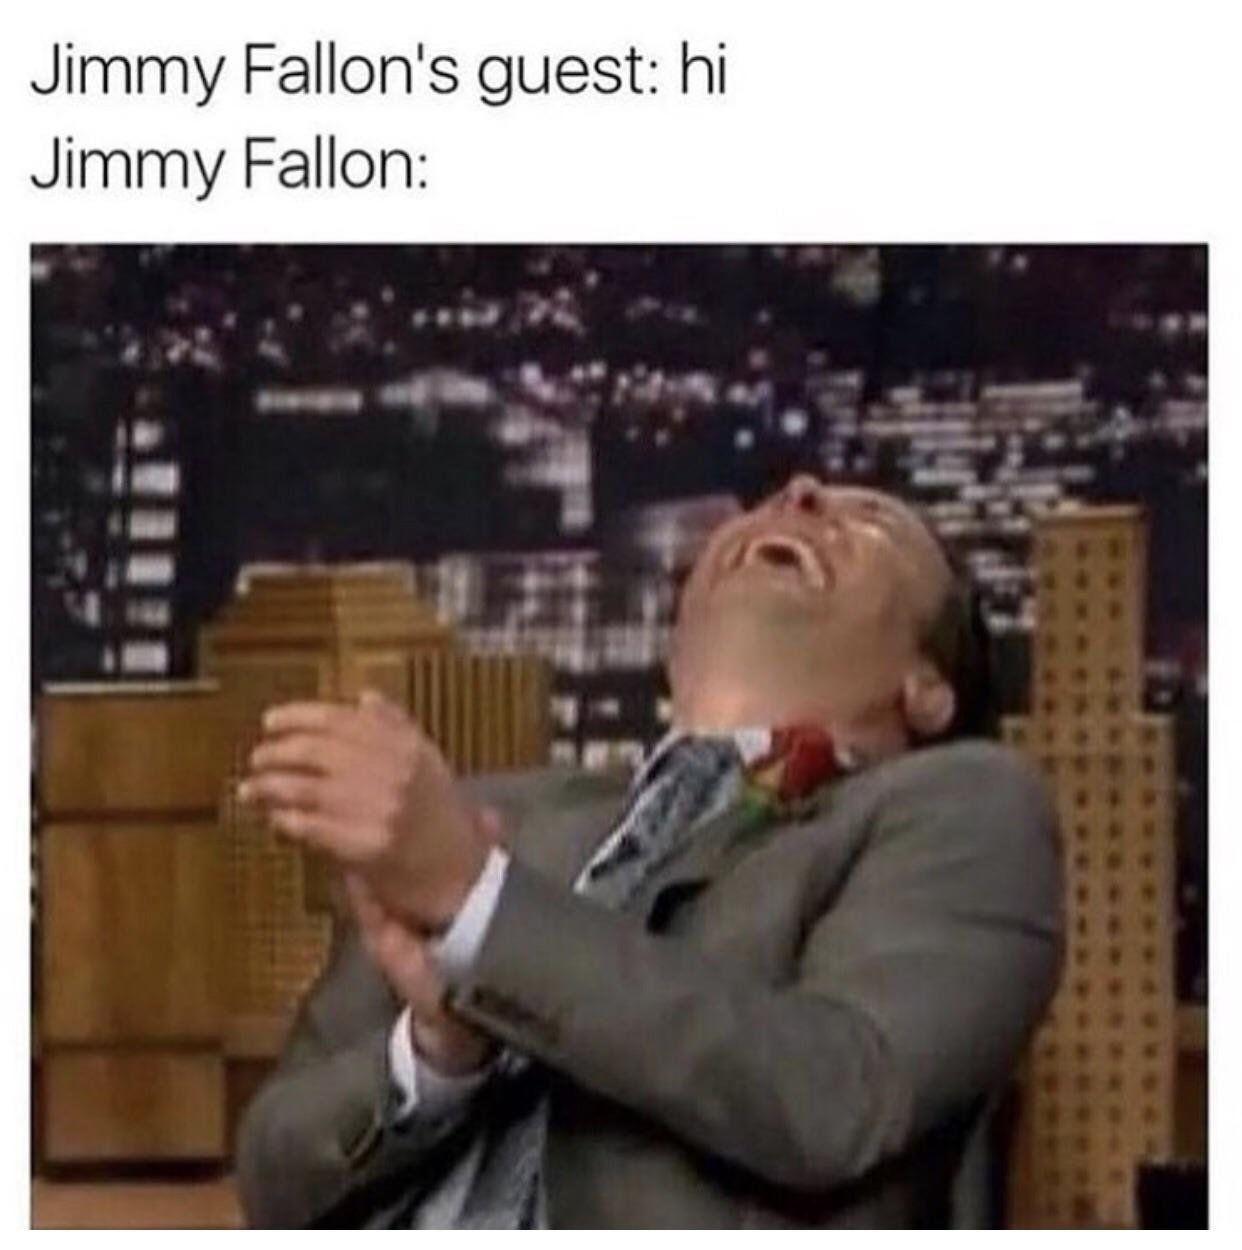 Humor Funny Meme Picture Kickass Jimmy Fallon Guests Memes Jimmy Fallon